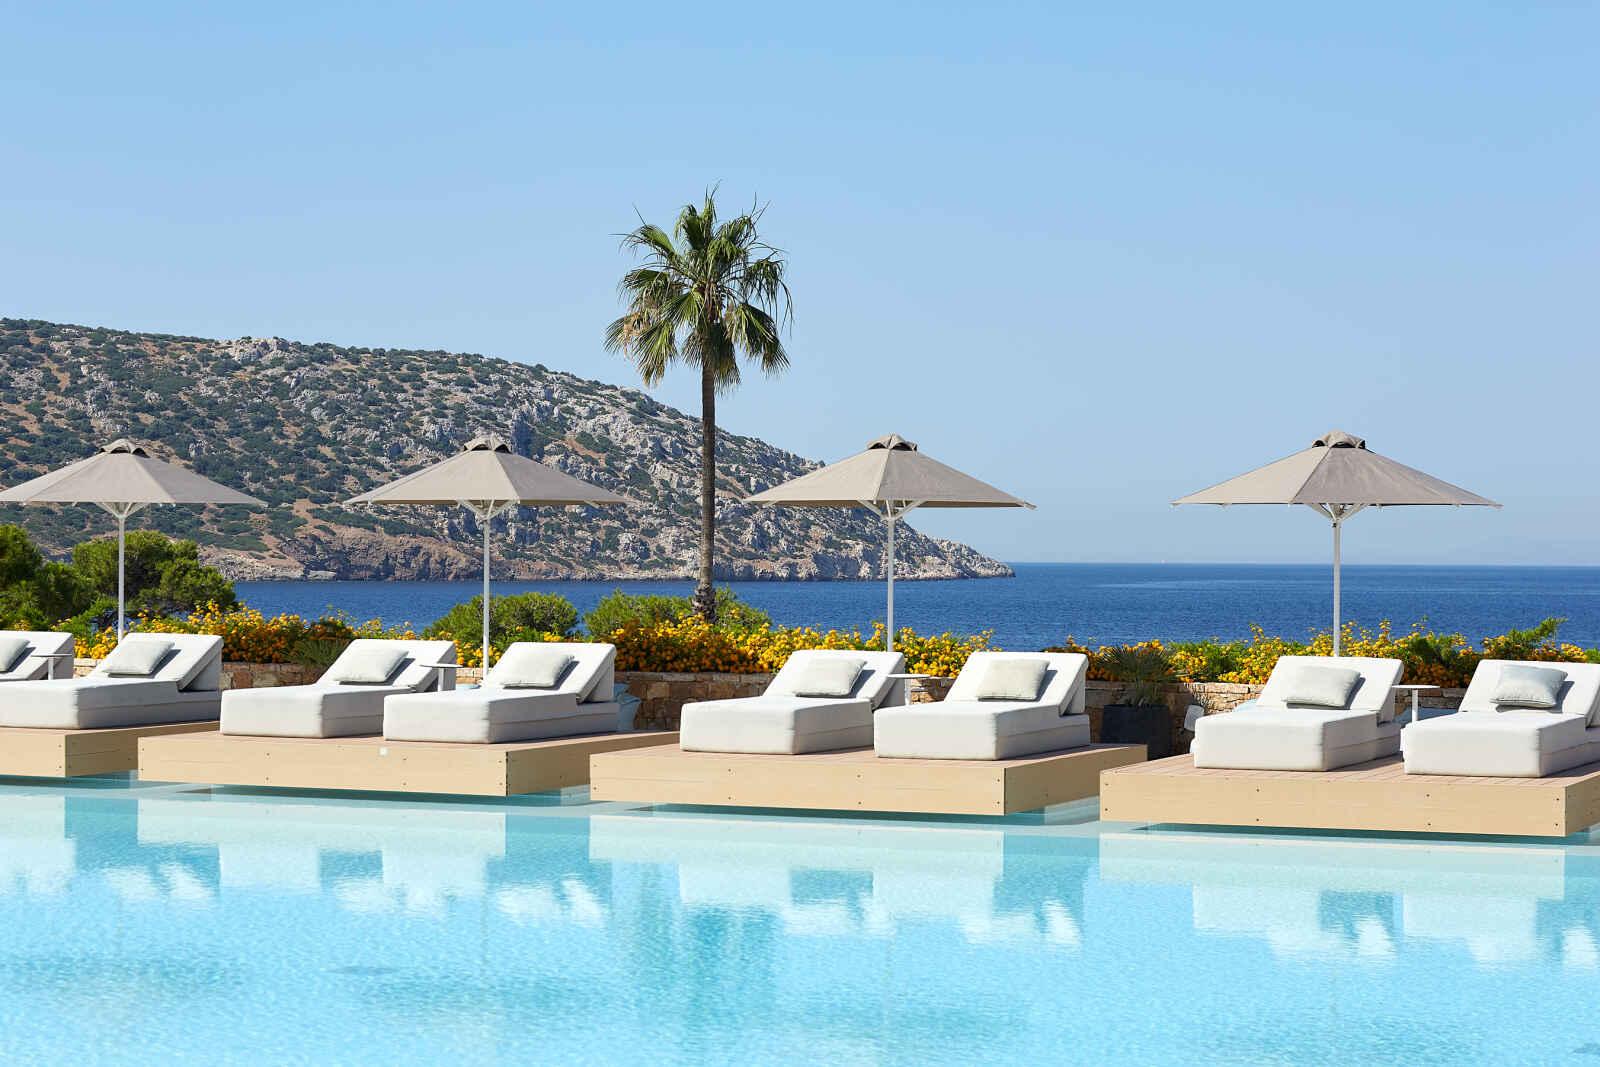 Séjour Grèce continentale - EverEden Beach Resort - 4*